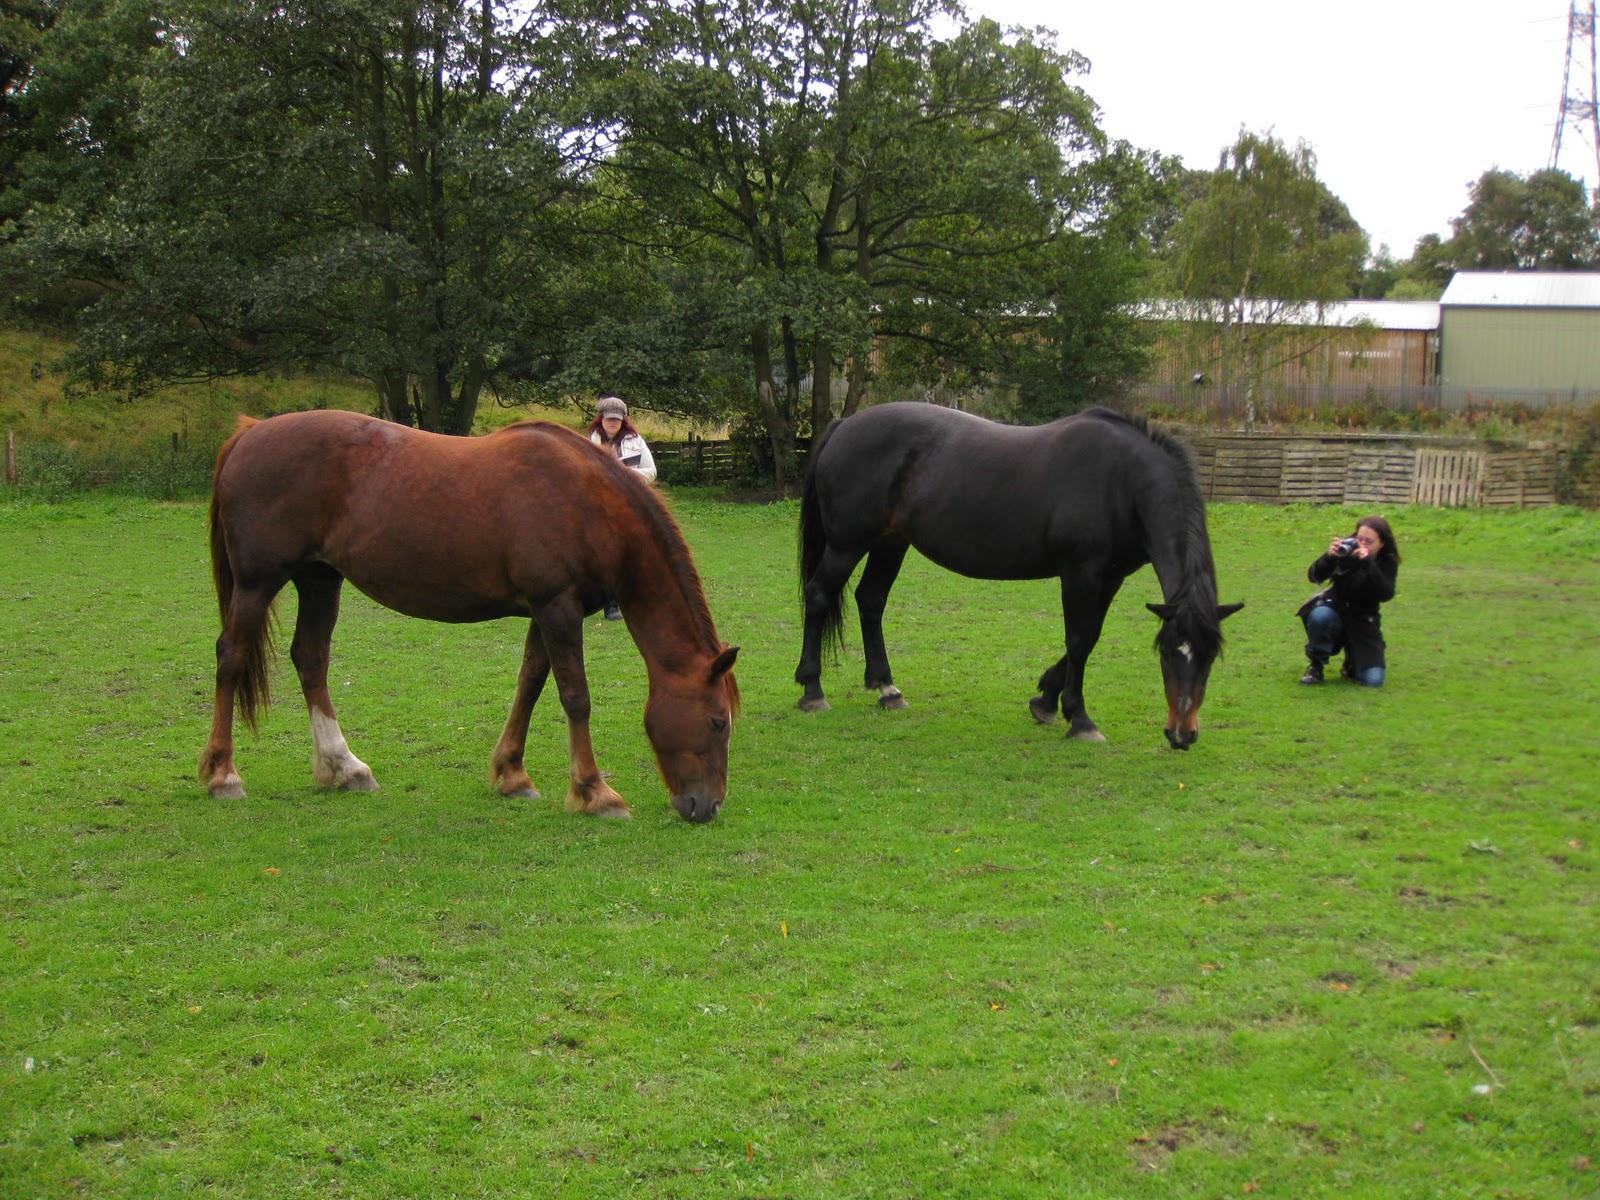 http://1.bp.blogspot.com/_m10ZmUU_m2Q/TKMC1J2IFNI/AAAAAAAACTc/egFFhU3M9LU/s1600/10+09+coldstream+cut+nidderdale+and+horses+033.jpg